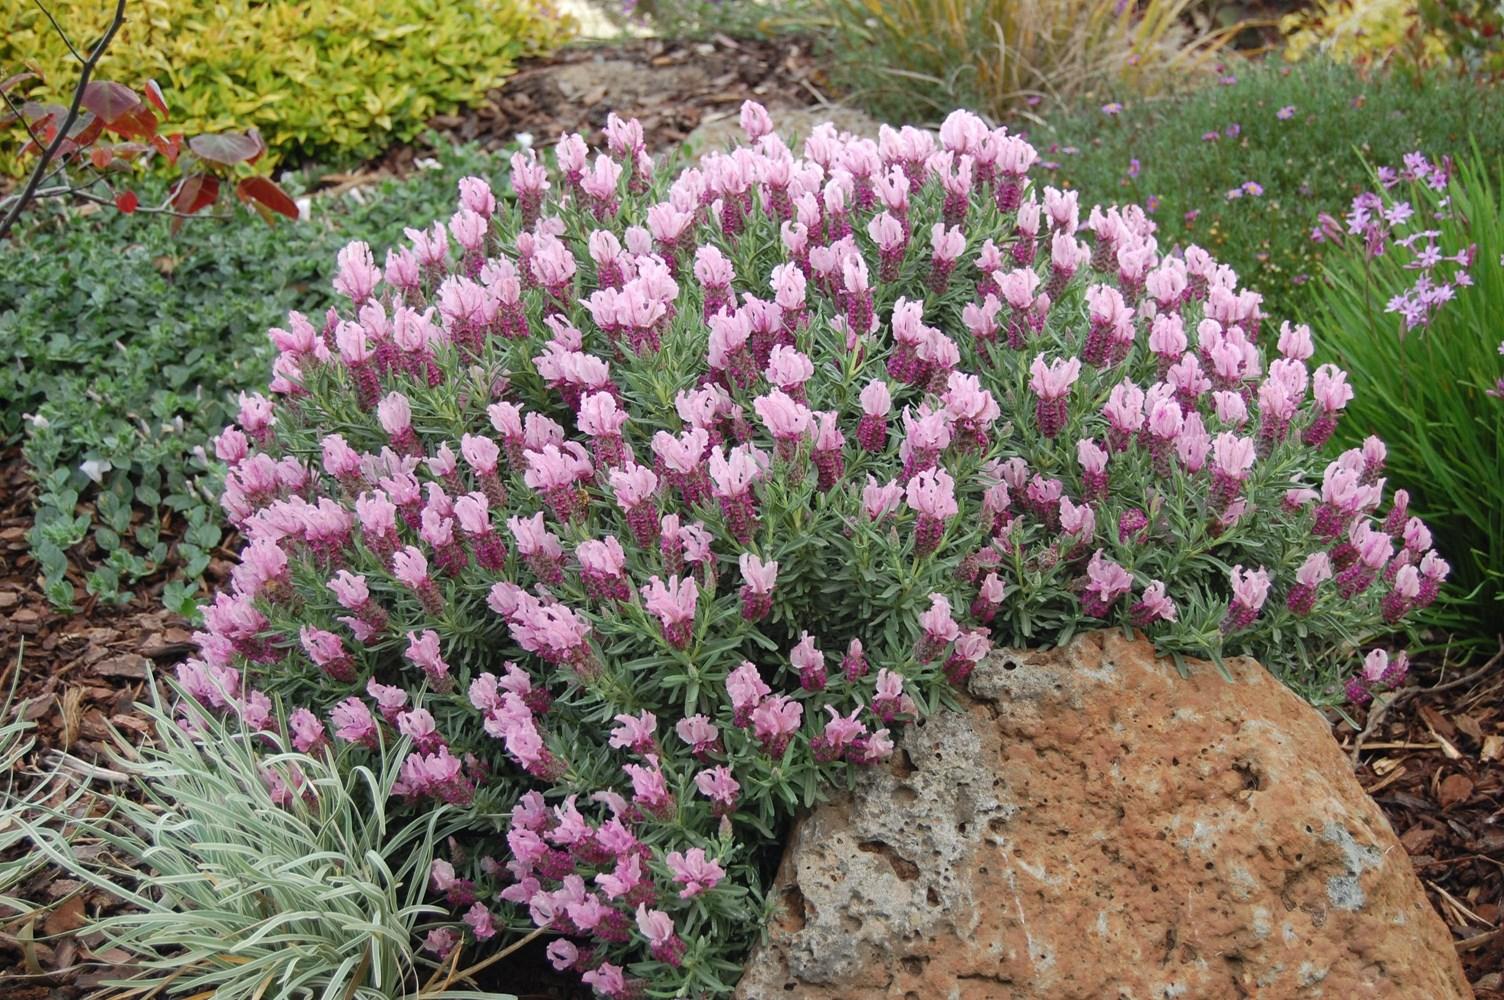 Website/Plants/1823980384/Images/Gallery/l_strawberryruffles_06.0.jpg